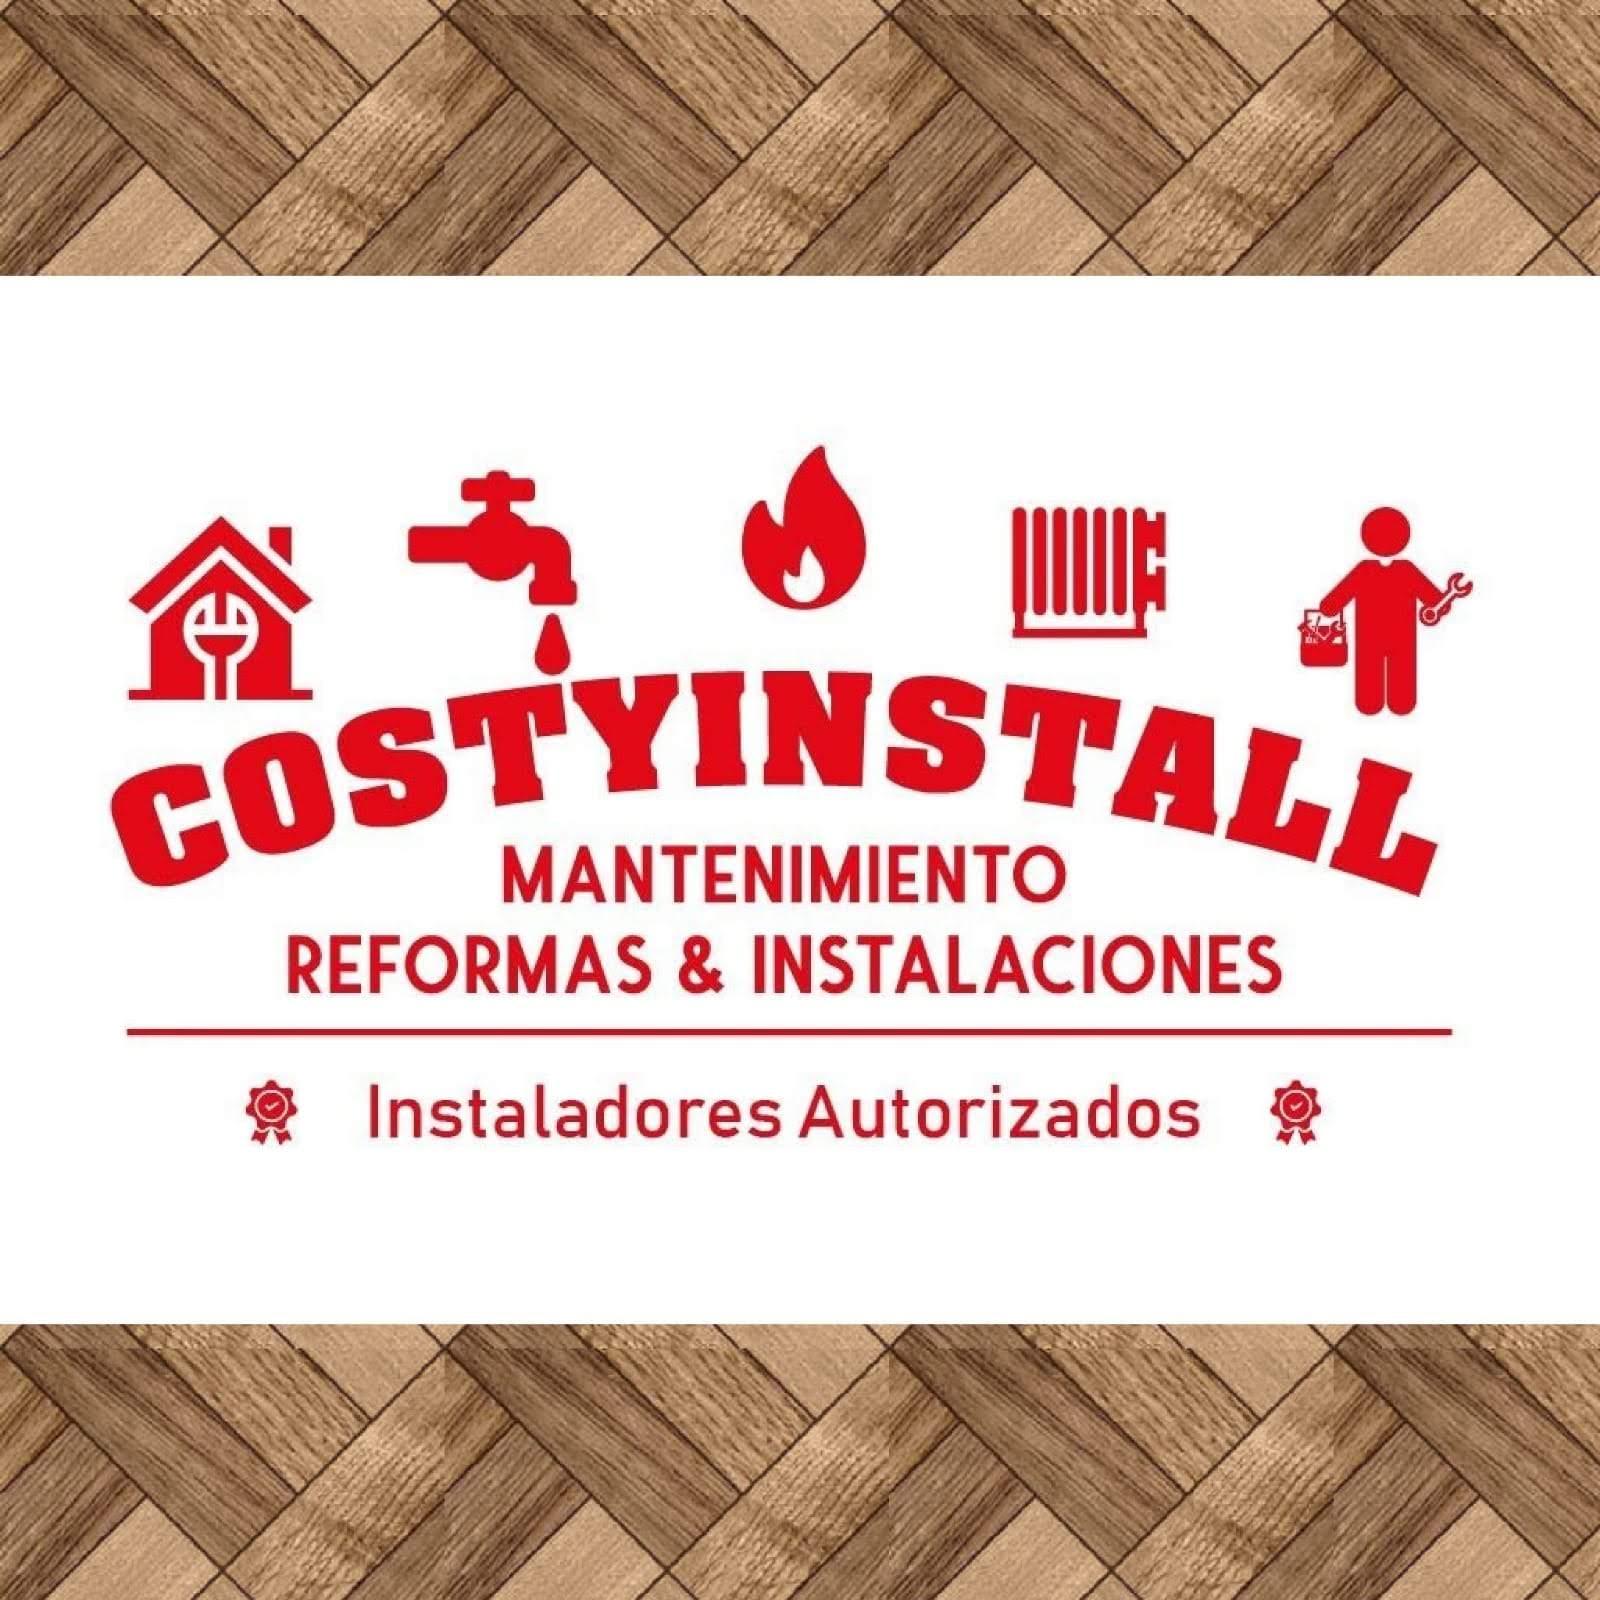 Costyinstall